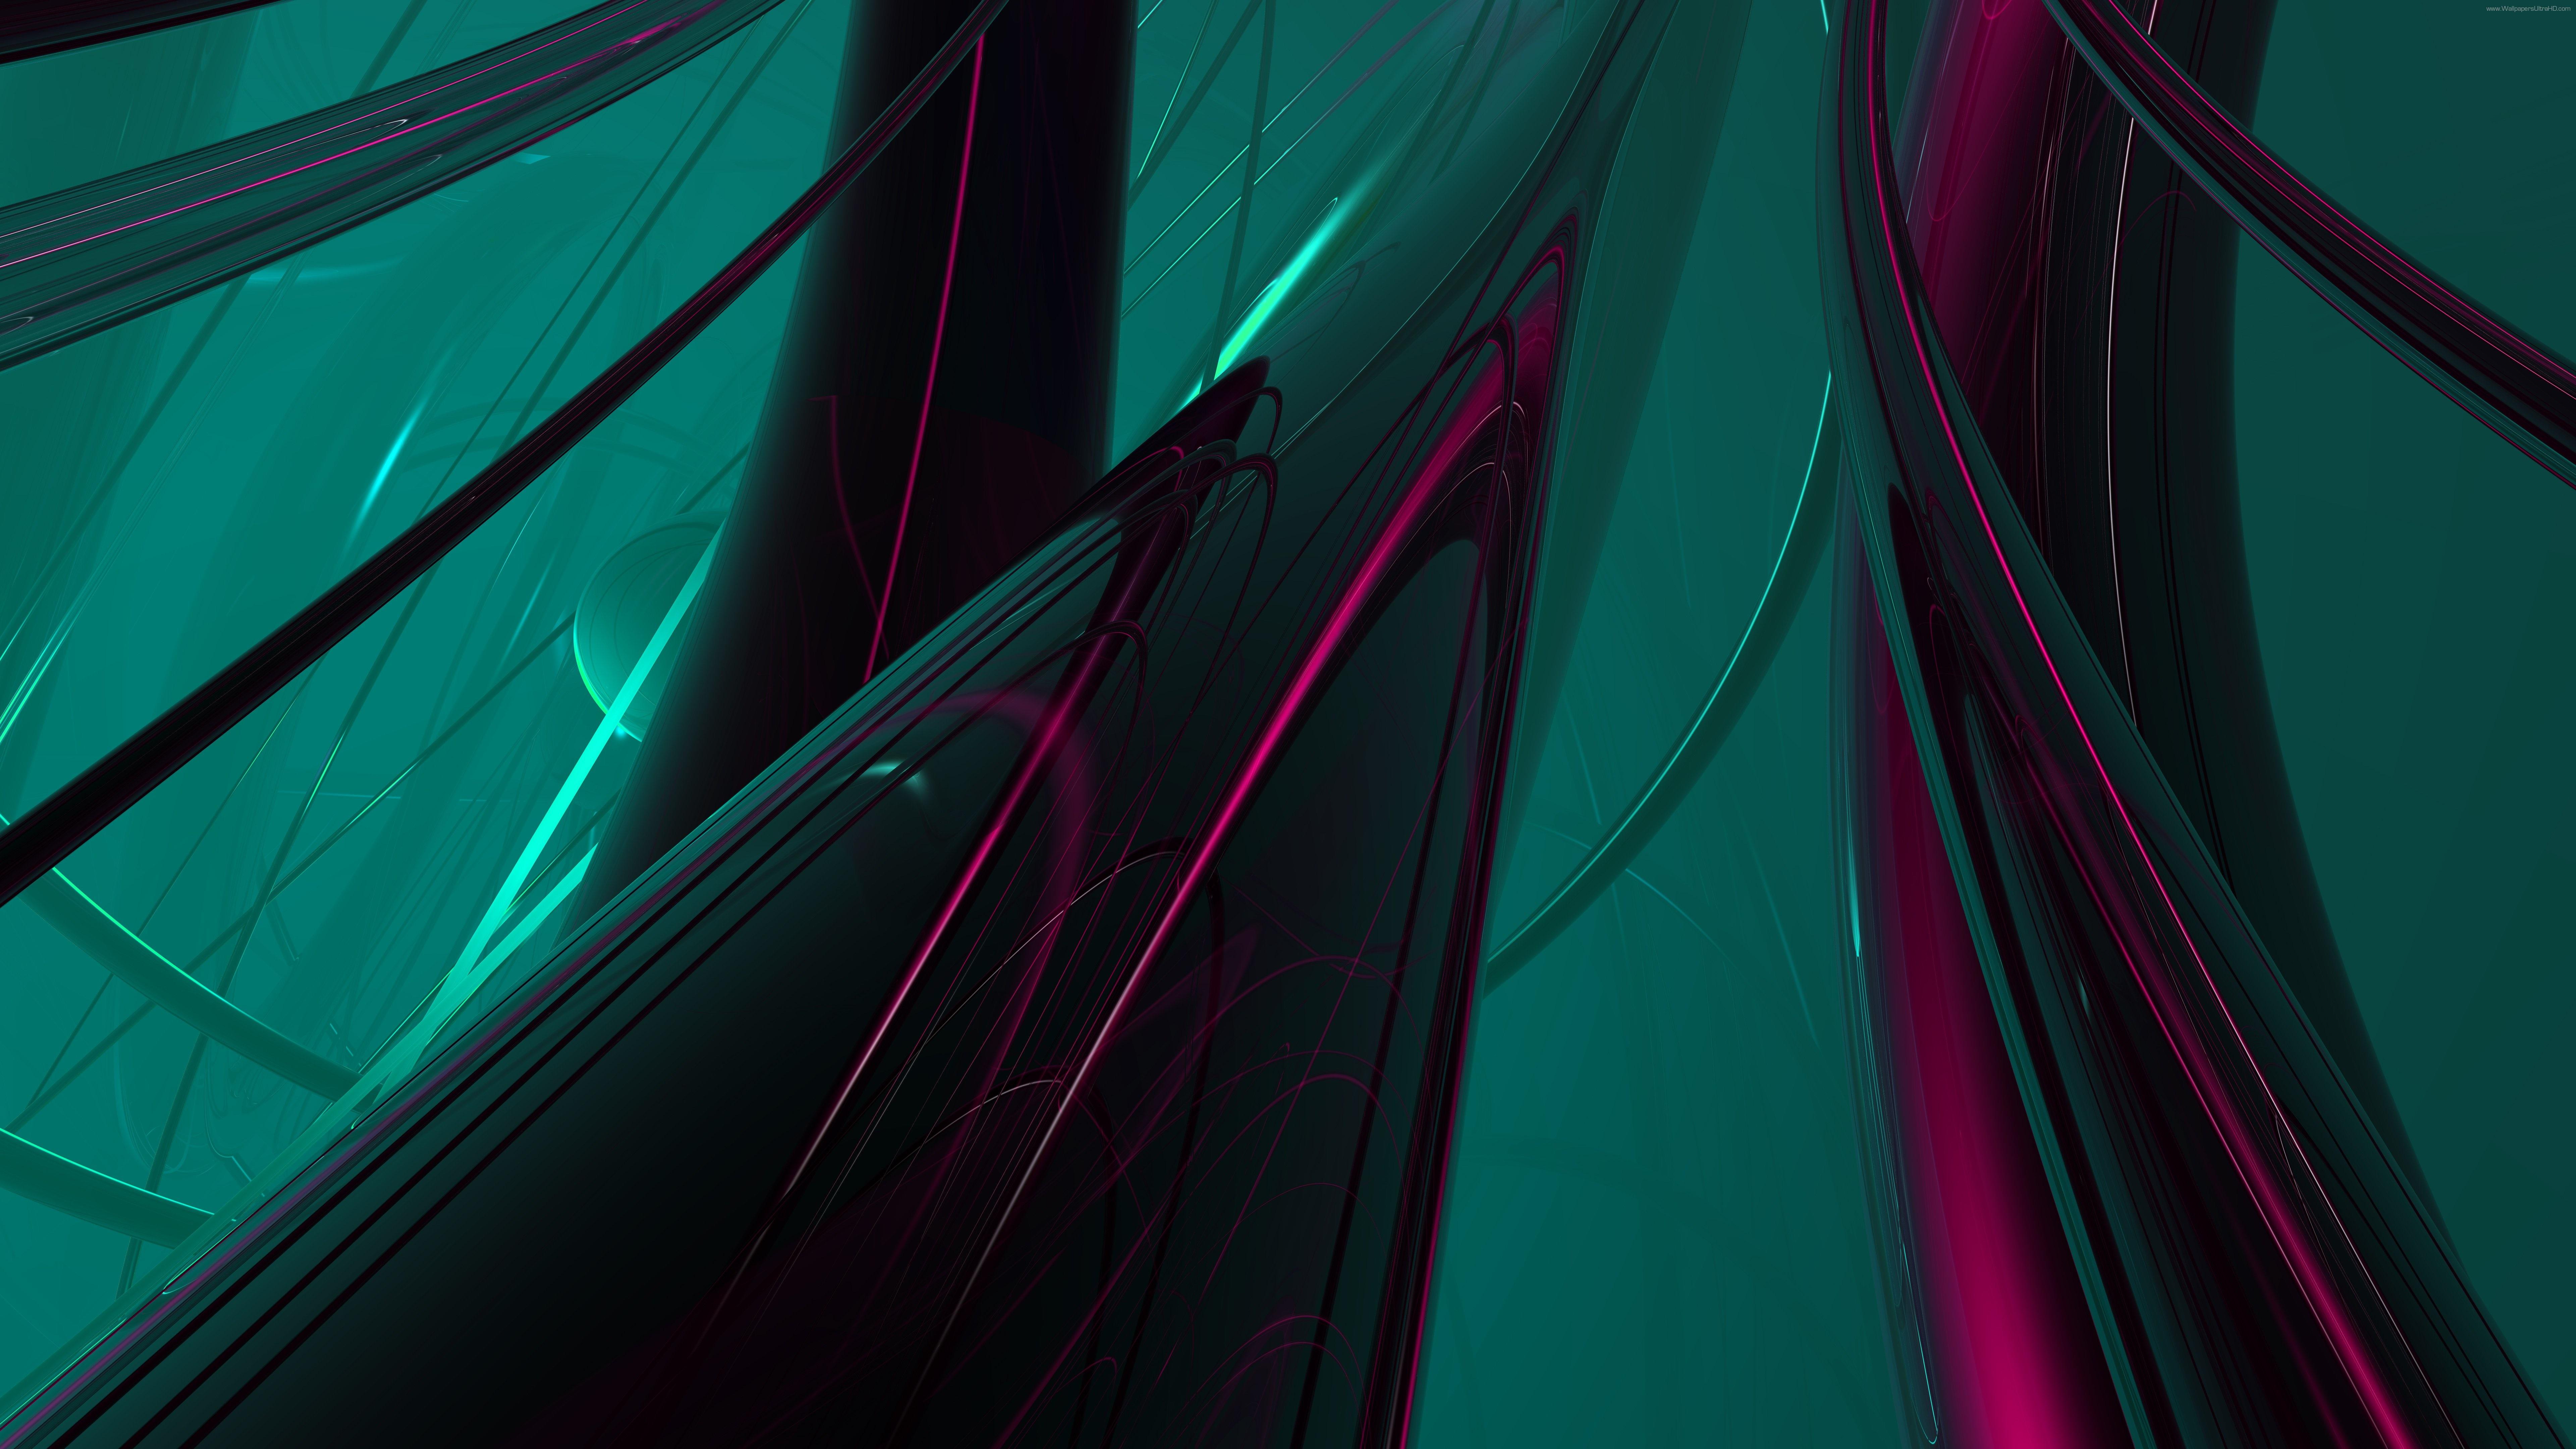 Tubes digital art wallpaper